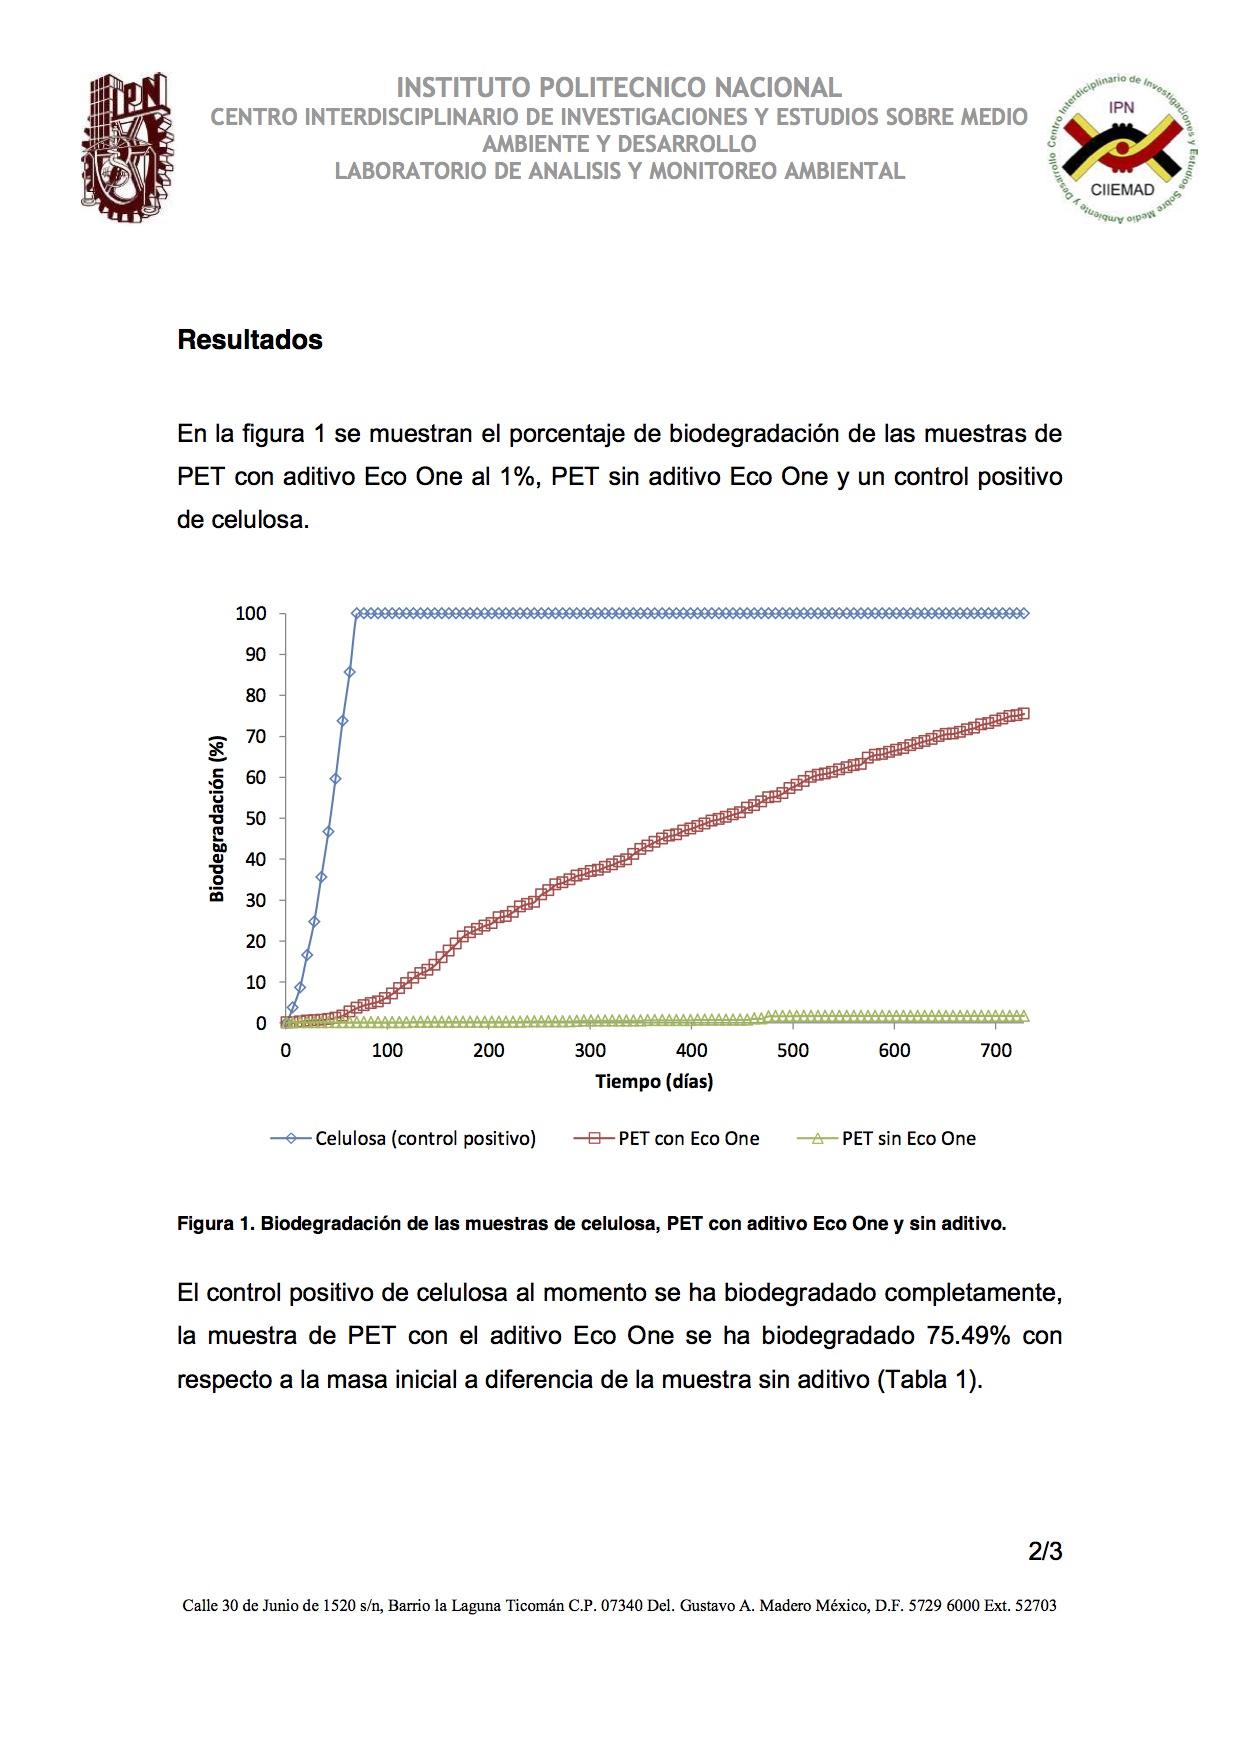 Biodegradación PET Biorganica pagina 2.jpg